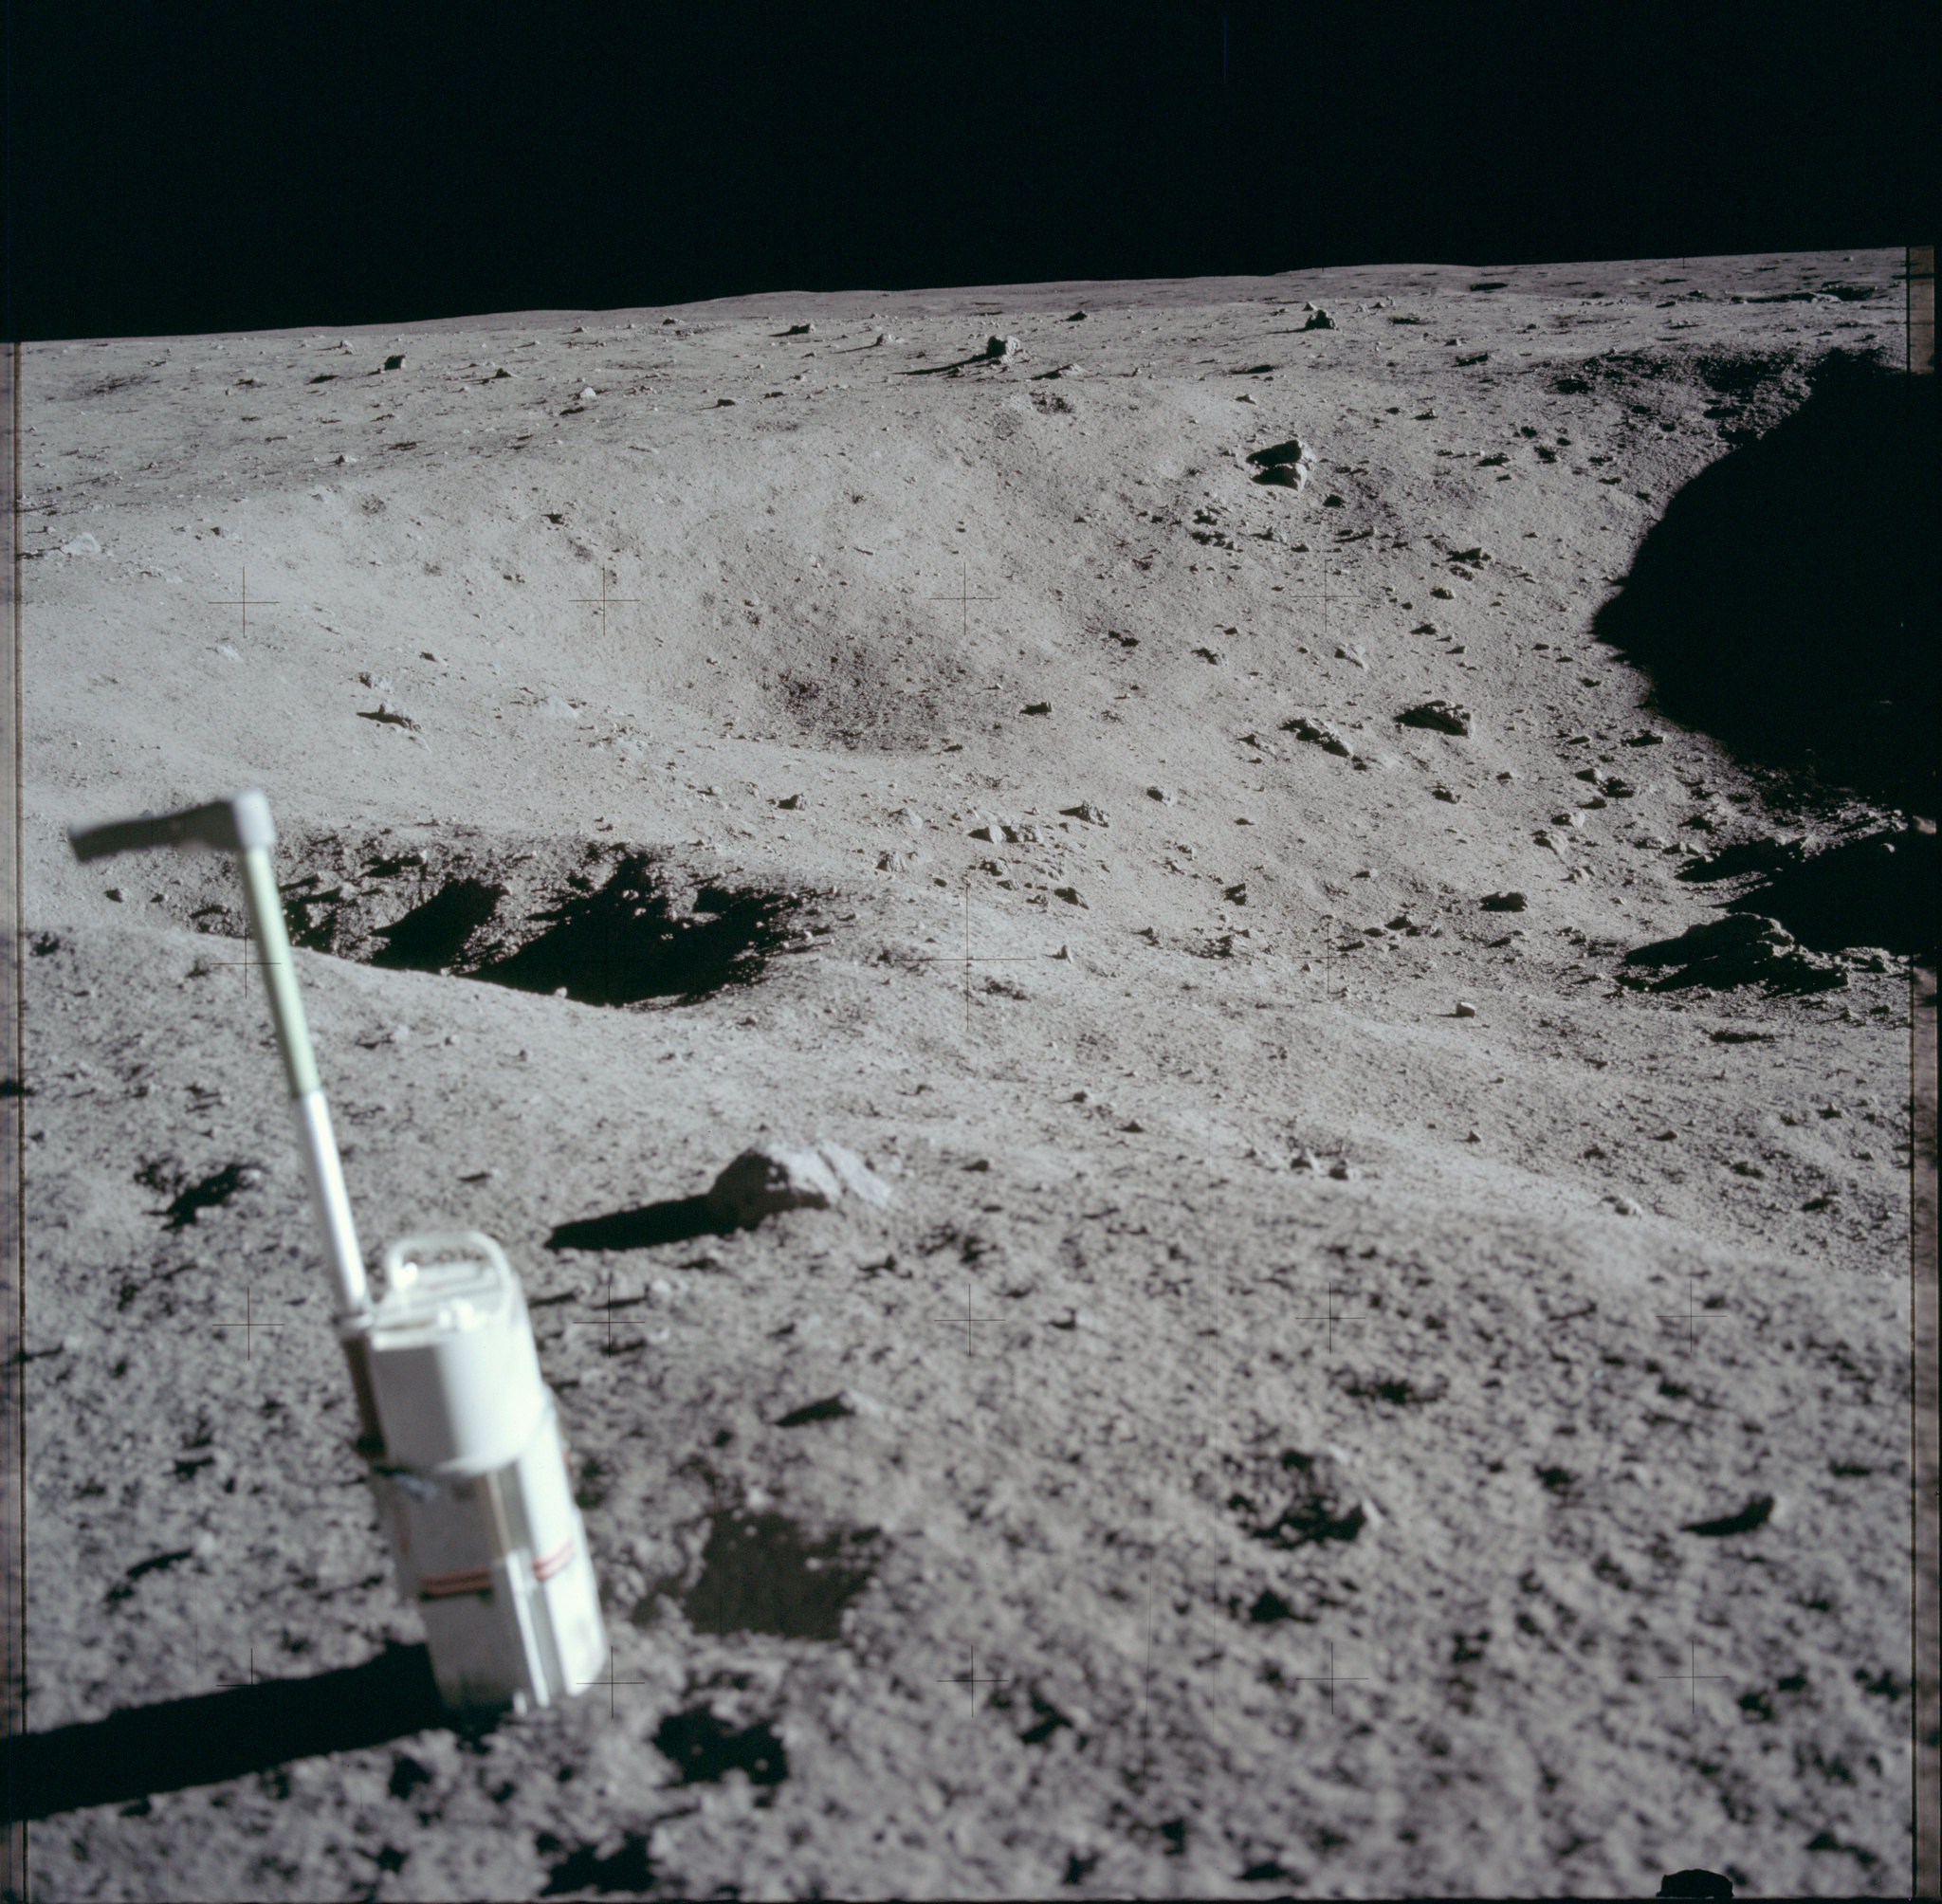 ALSCC on lunar surface (Pic: Nasa)